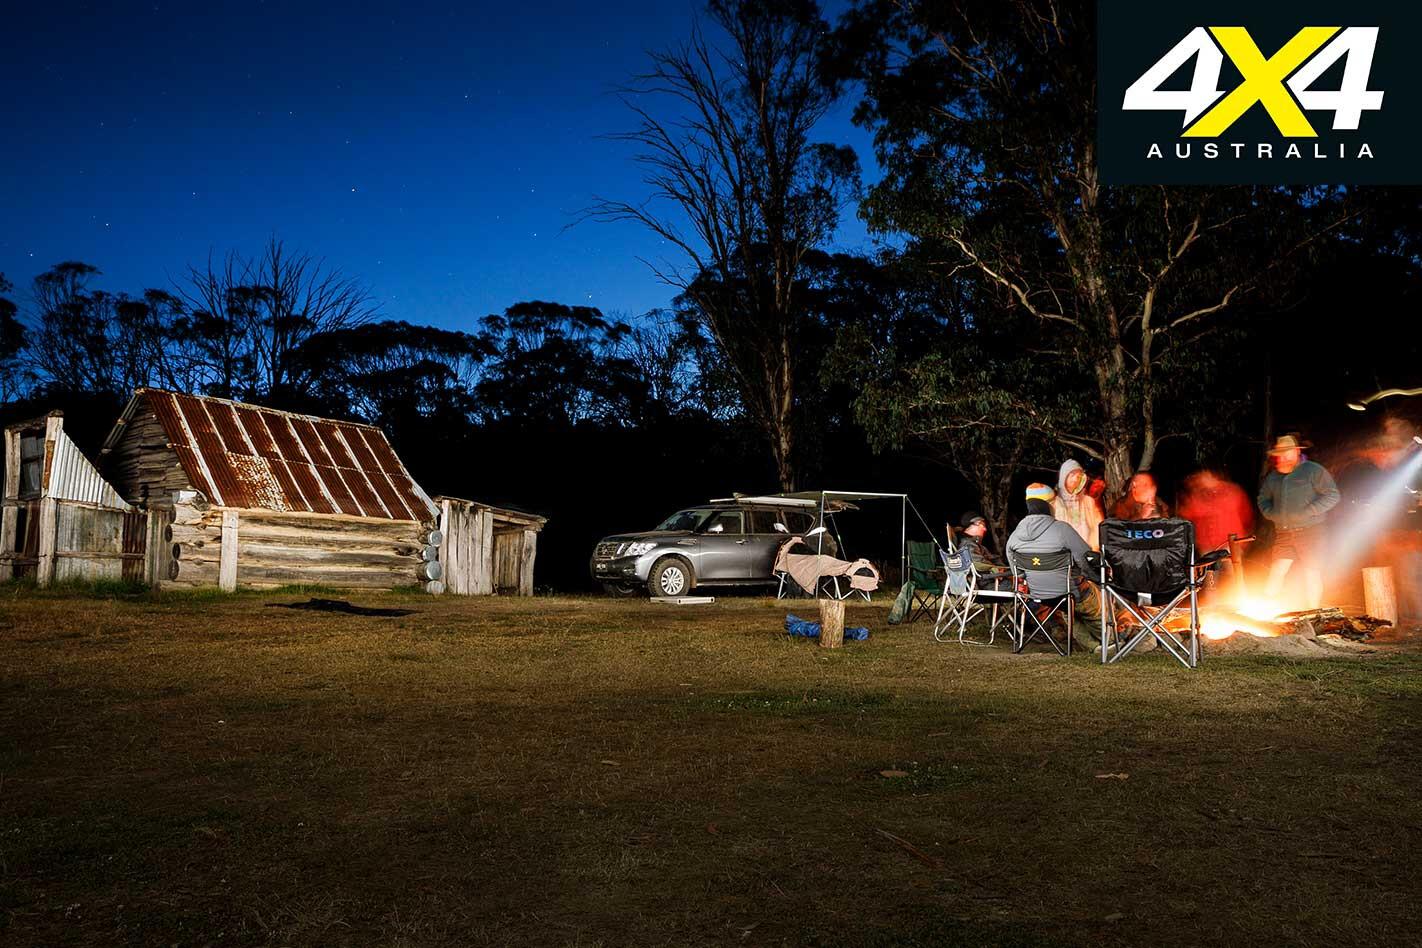 Victorian High Country 4 X 4 Adventure Series Night Campfire Jpg